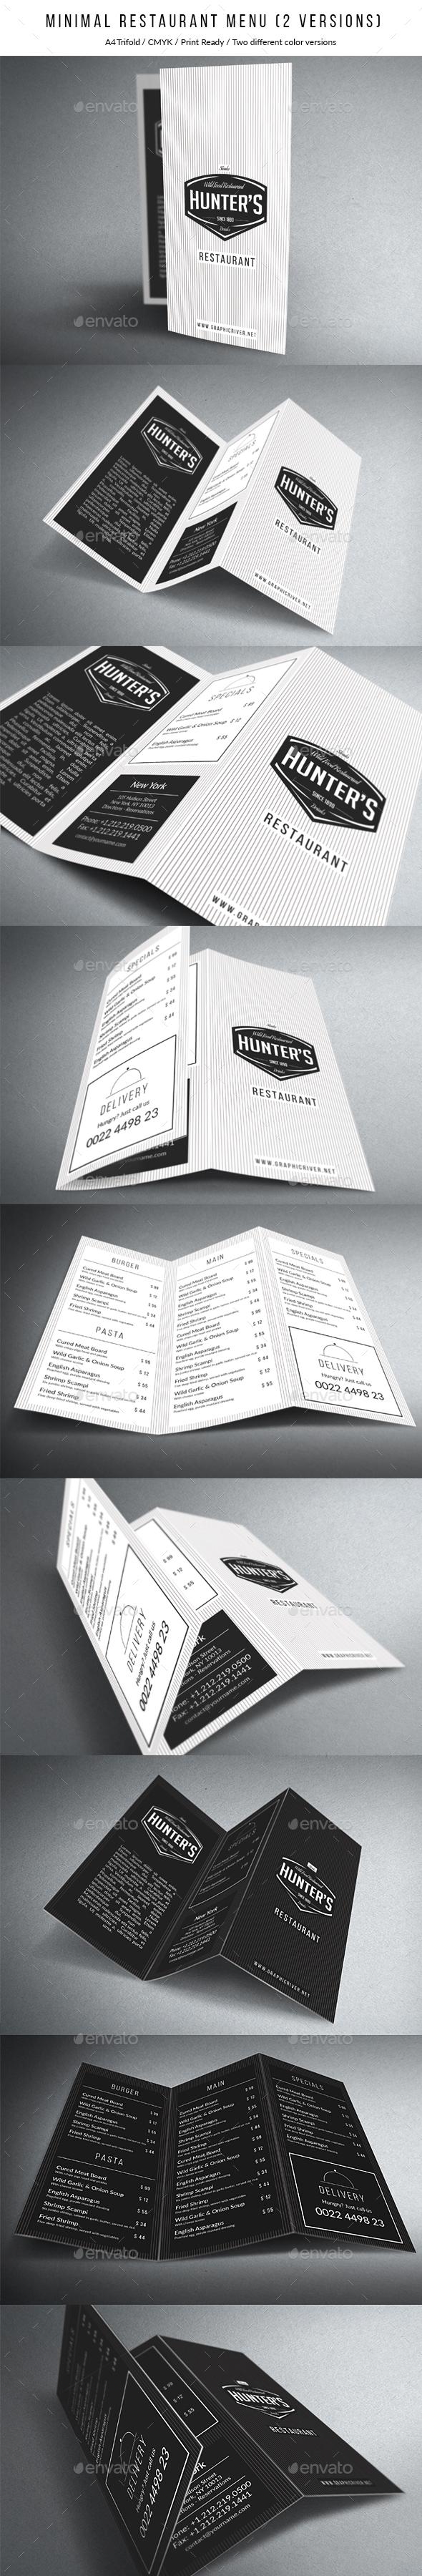 Minimal A4 Trifold Menu - 2 Versions - Food Menus Print Templates